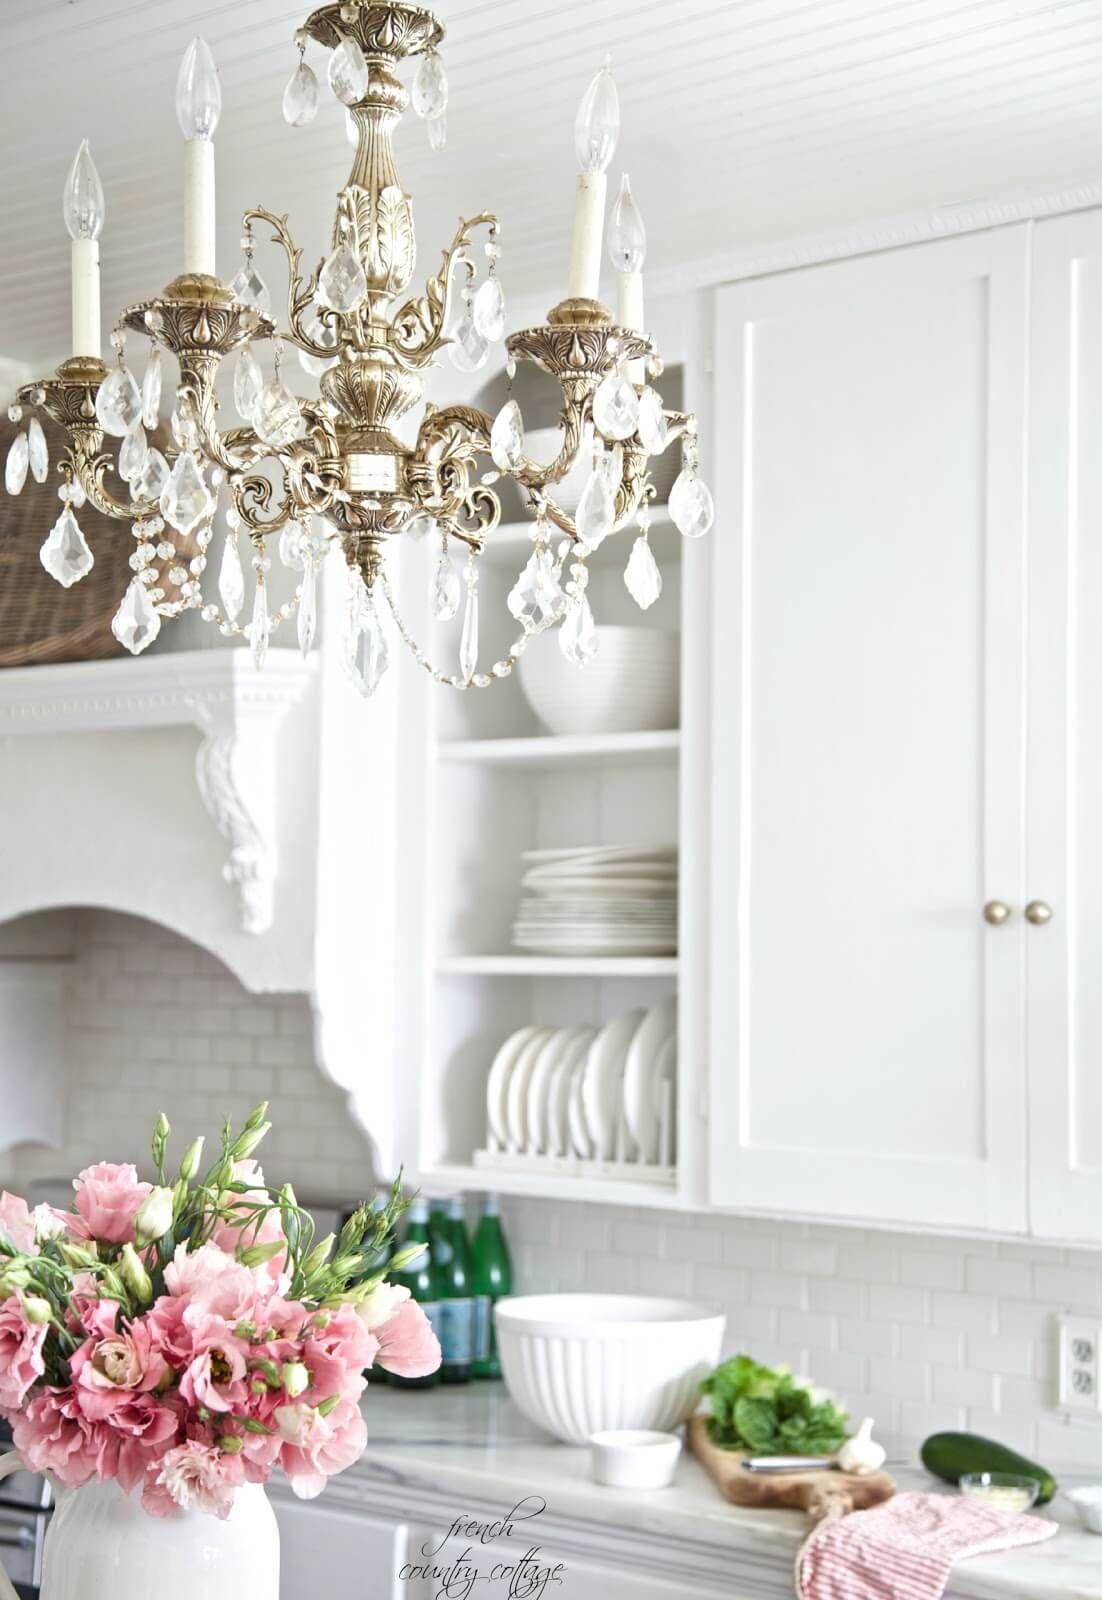 Shabby Gartendeko Einzigartig Silver and Crystal Chandelier with Wooden Cabinets